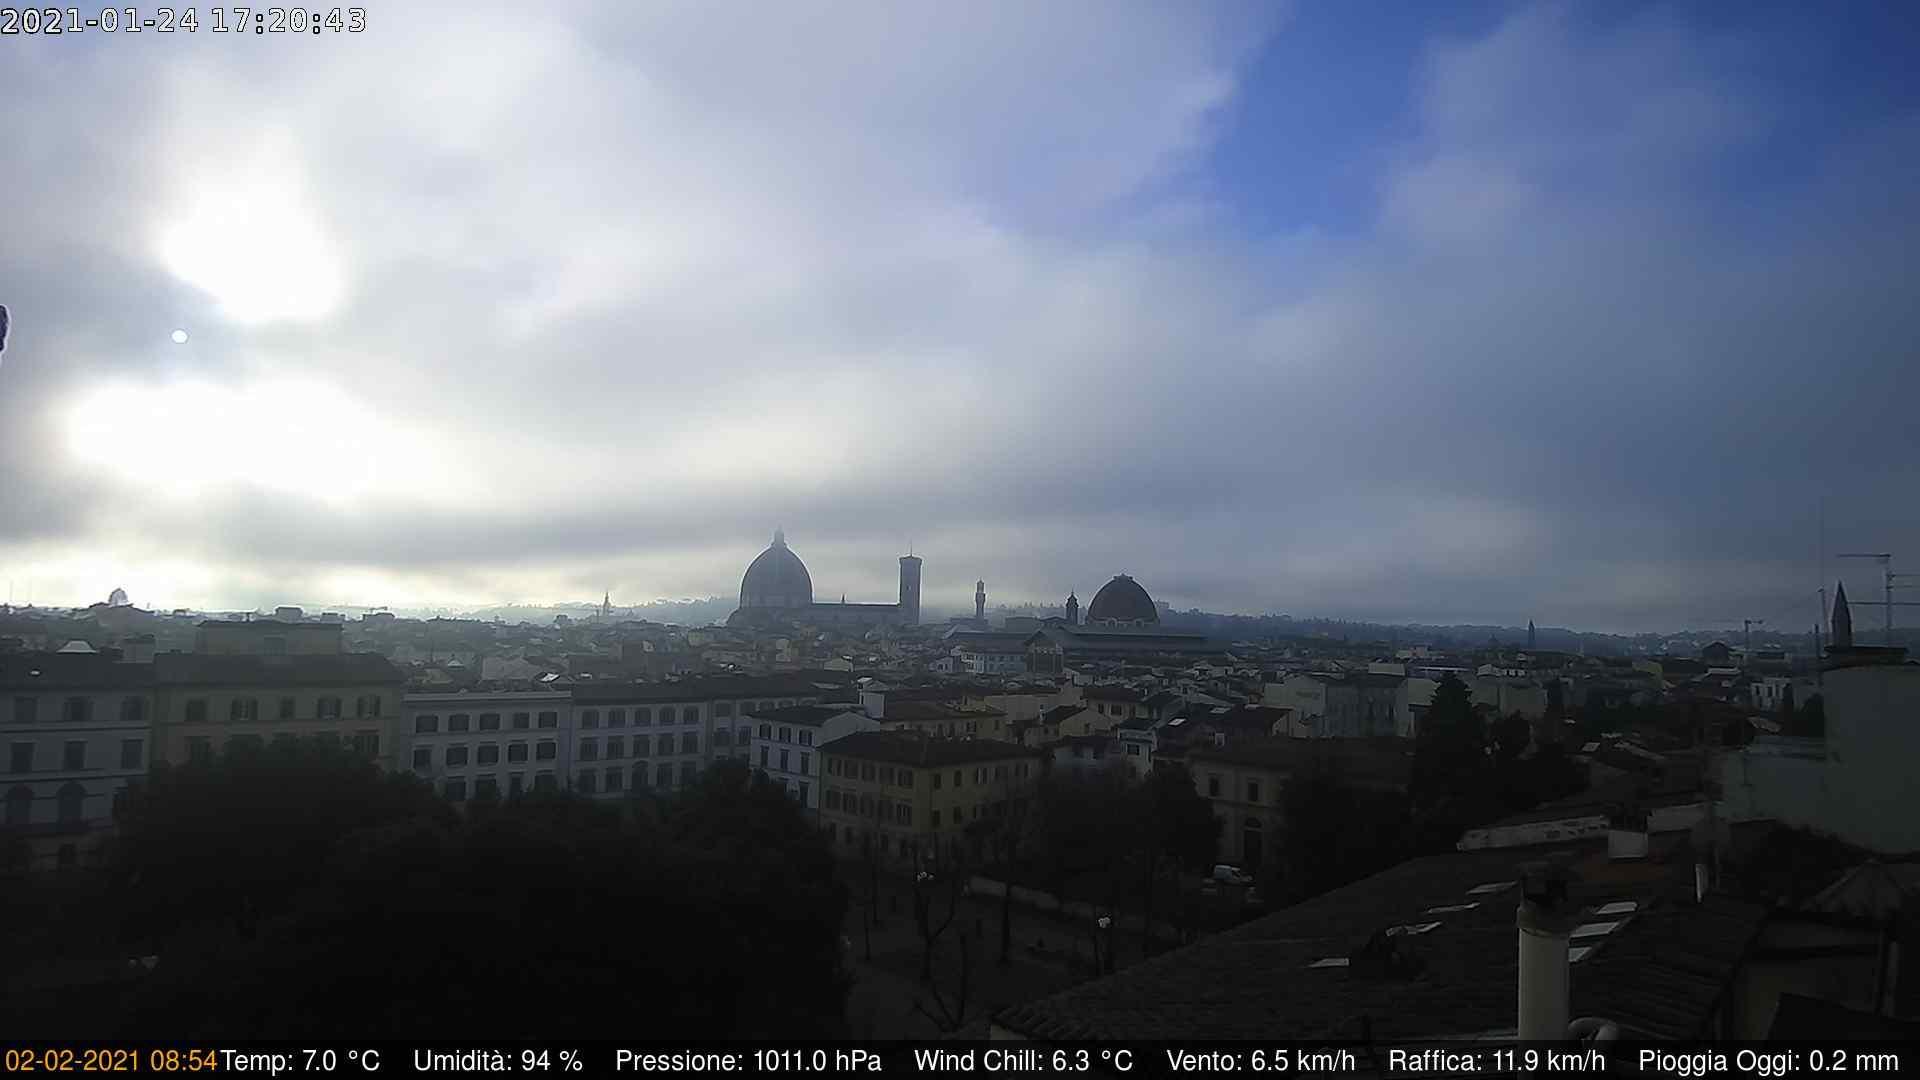 Webkamera Florence › South-East: Firenze Centro